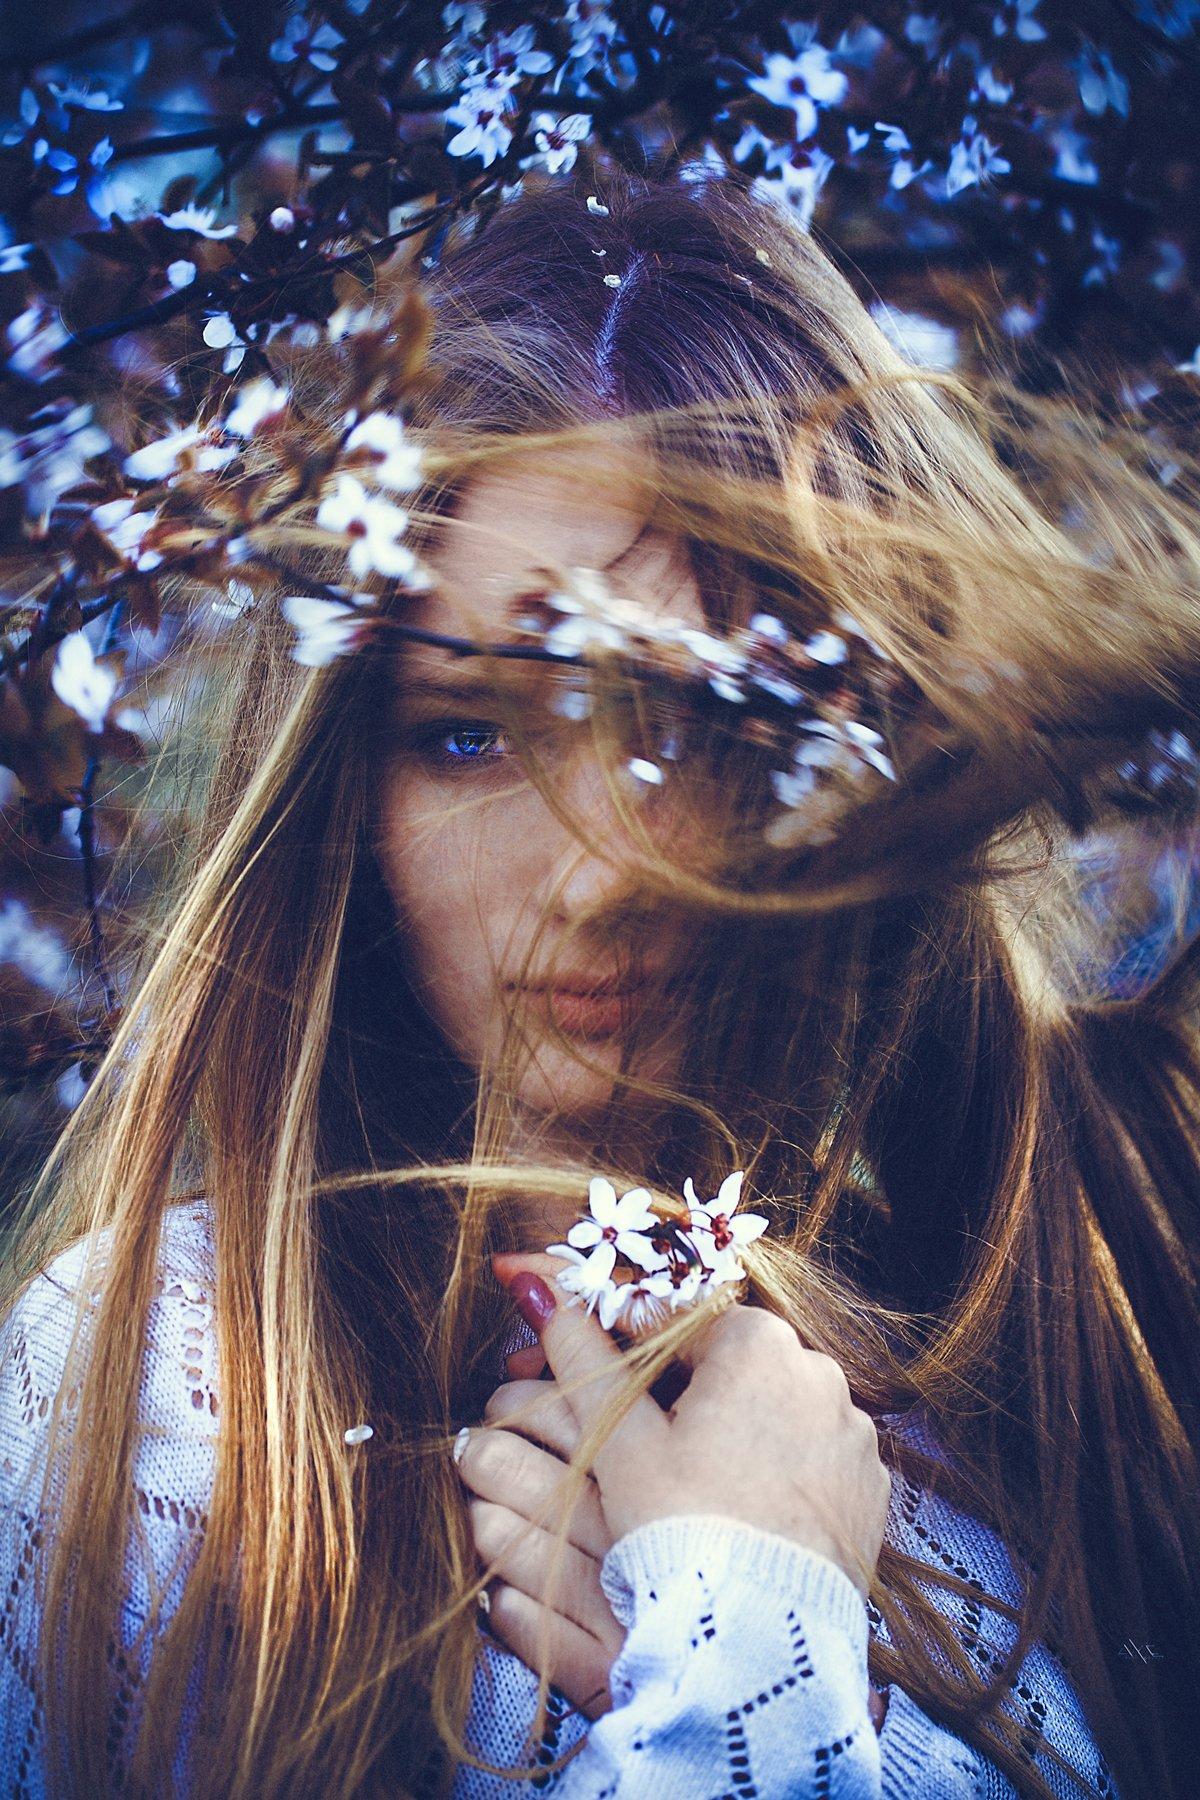 Apple garden, Blooming, Mood, Natural light, Portrait, Woman, Руслан Болгов (Axe)